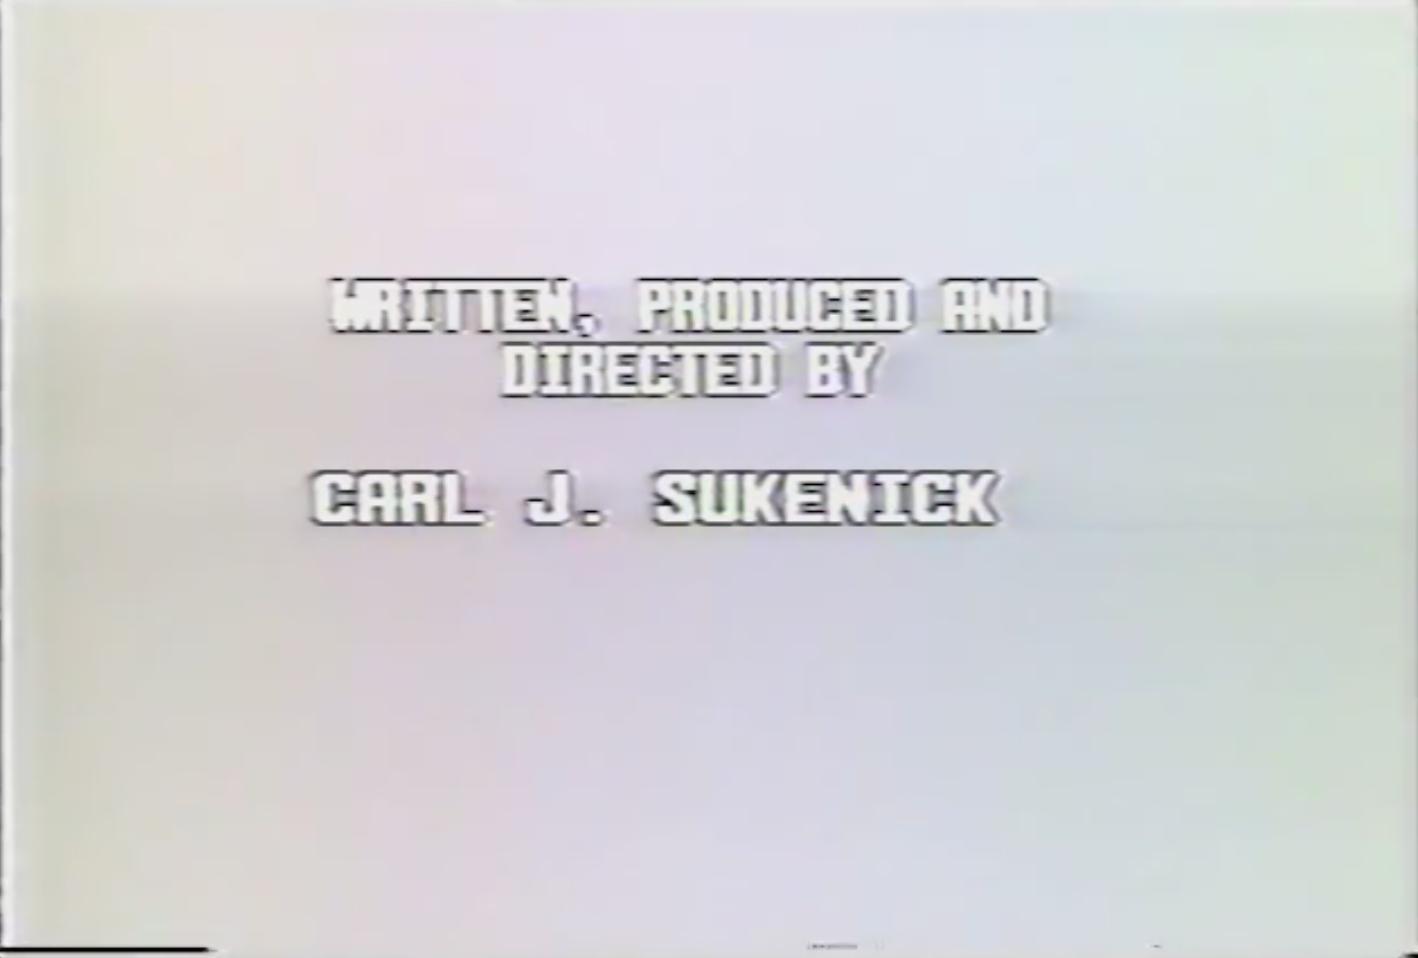 Sukenick credits